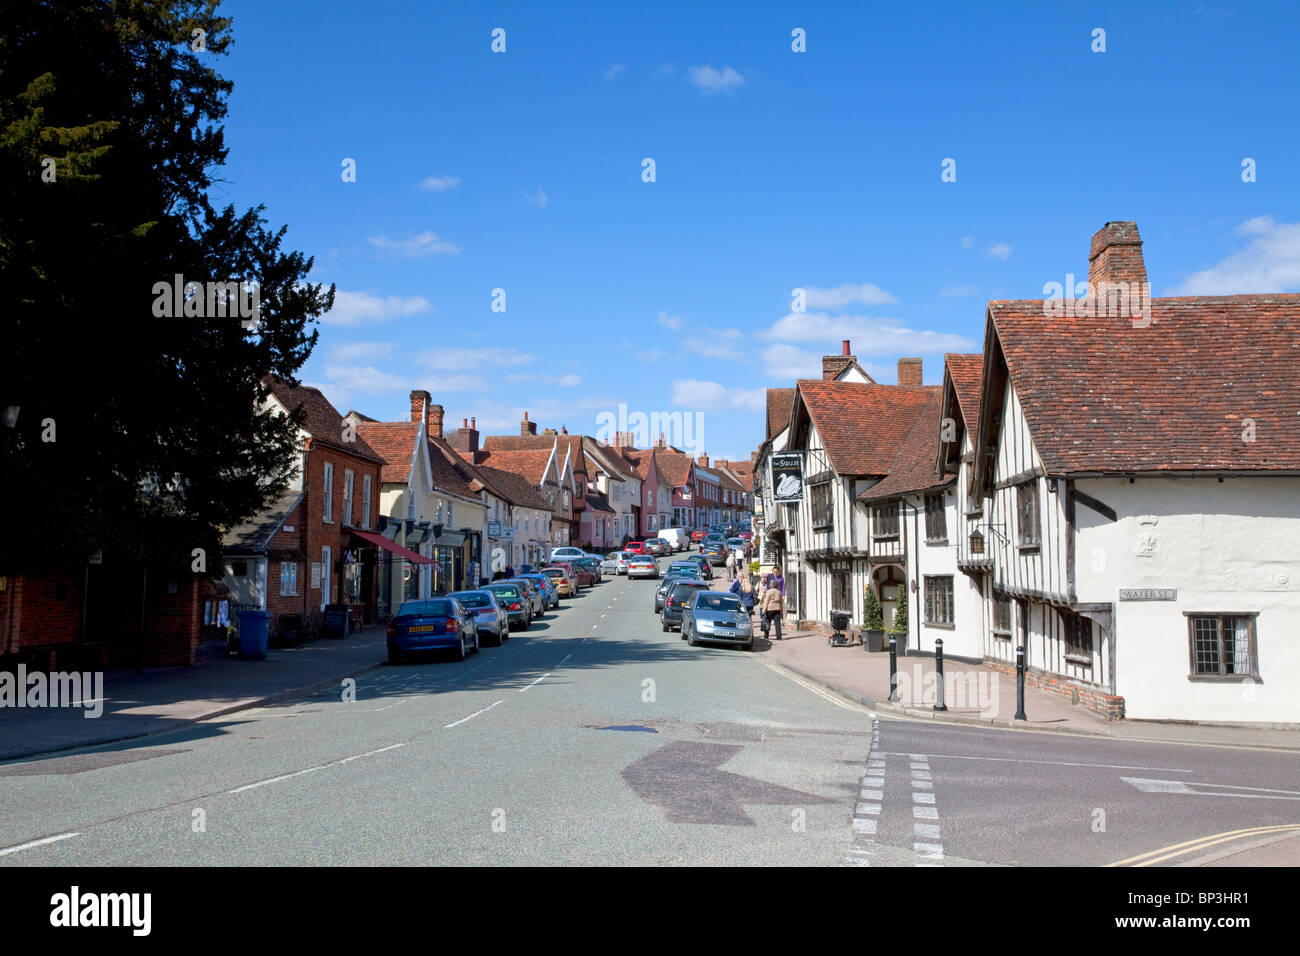 Historic Lavenham in  Suffolk on a bright sunny day - Stock Image